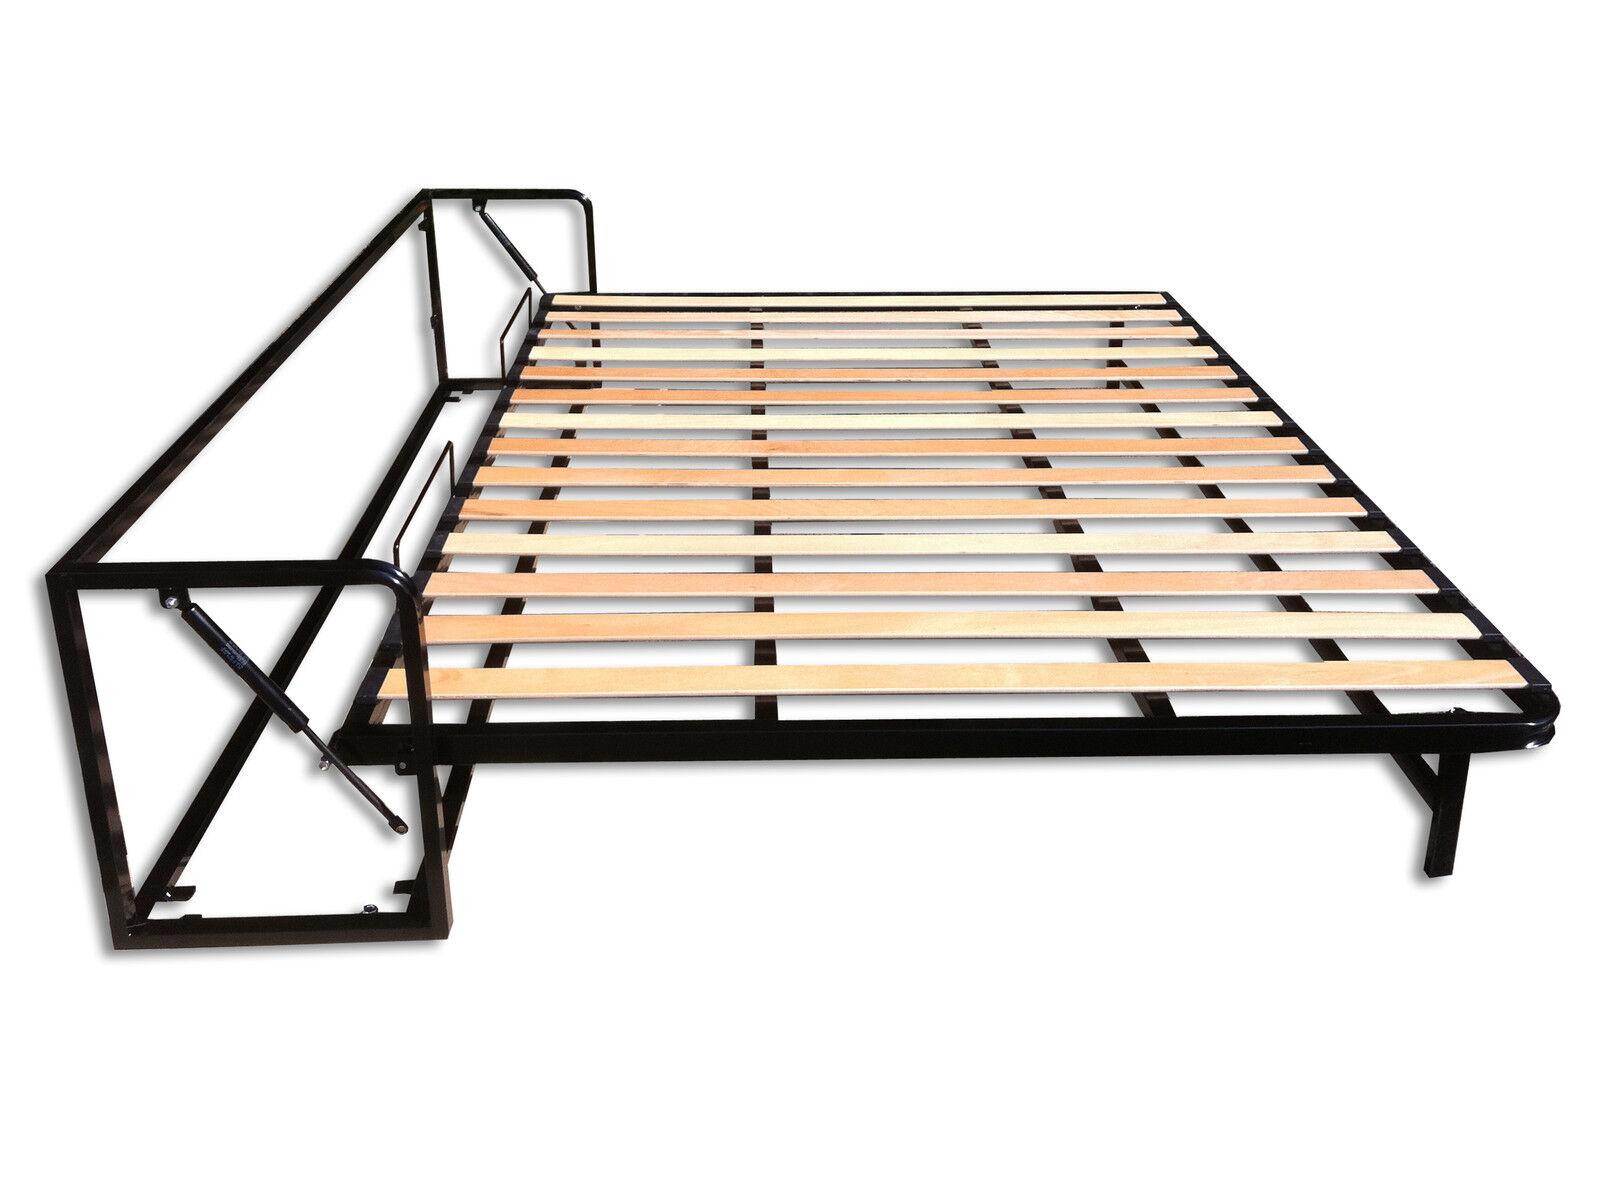 Somier cama abatible horizontal cama empotrable horizontal - Cama pared plegable ...